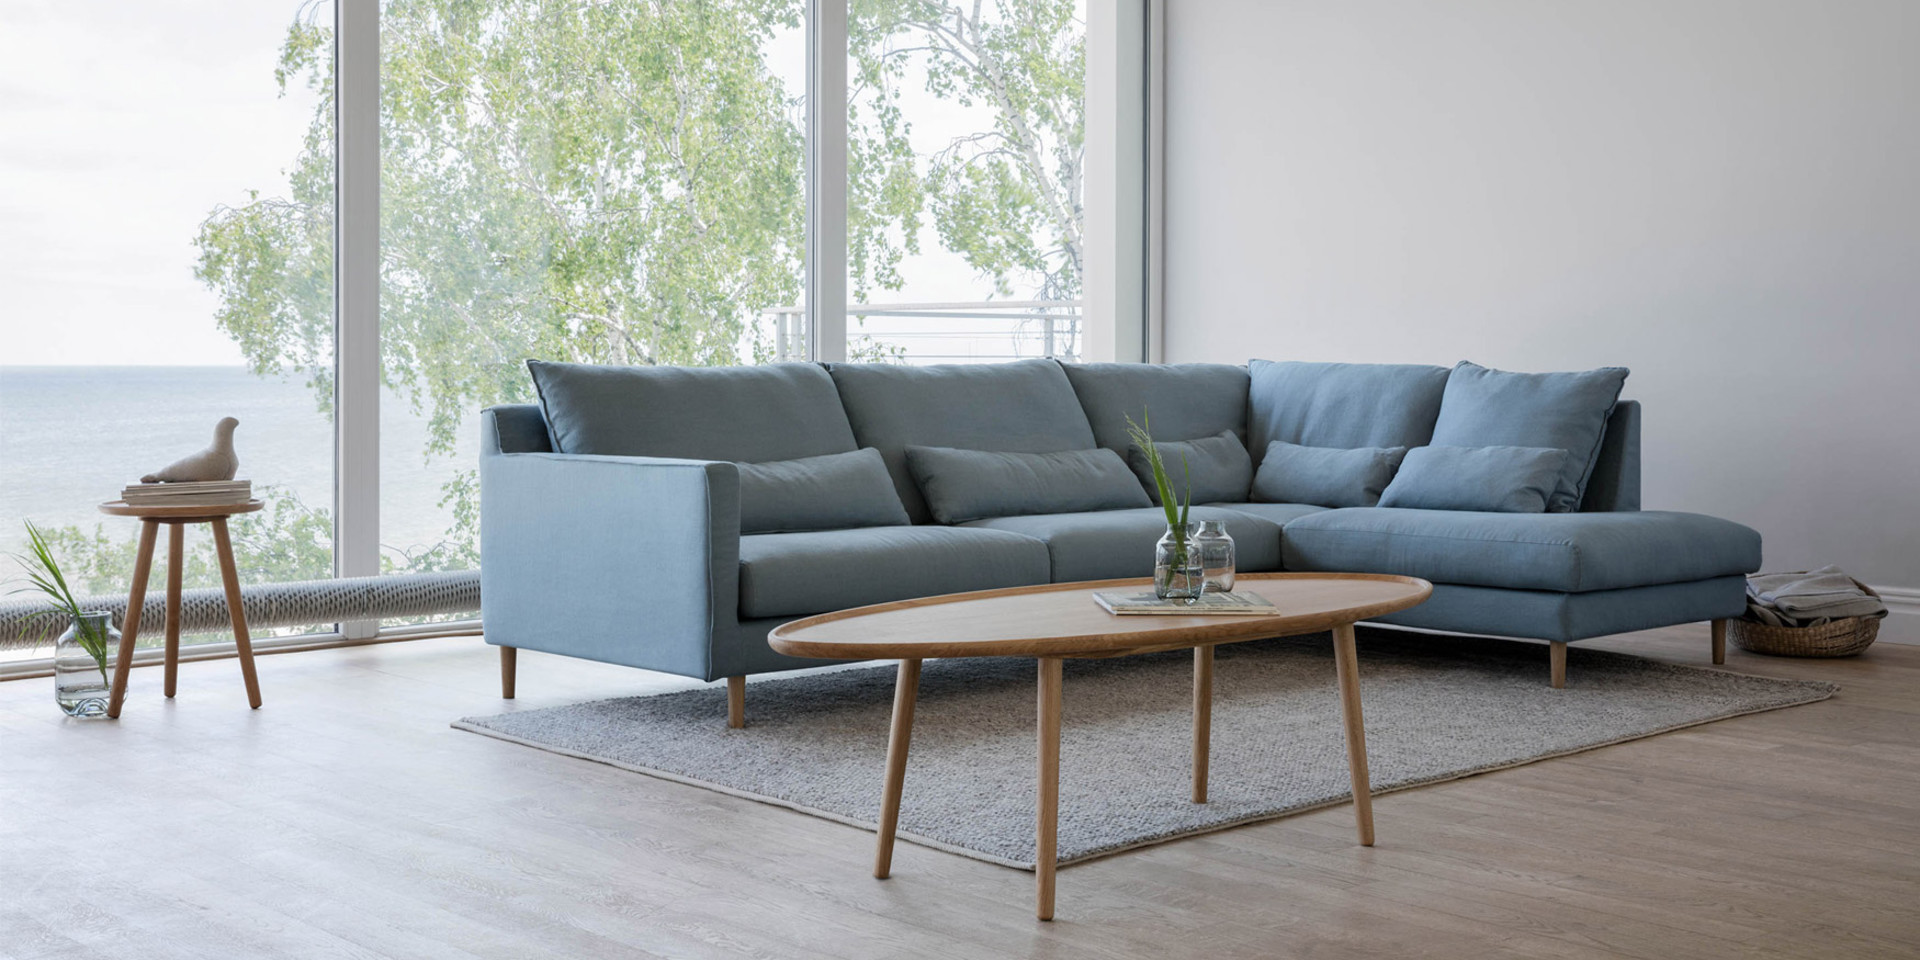 SALLY_arrangement_set2_big_cushions_linenP823_8_slate_7